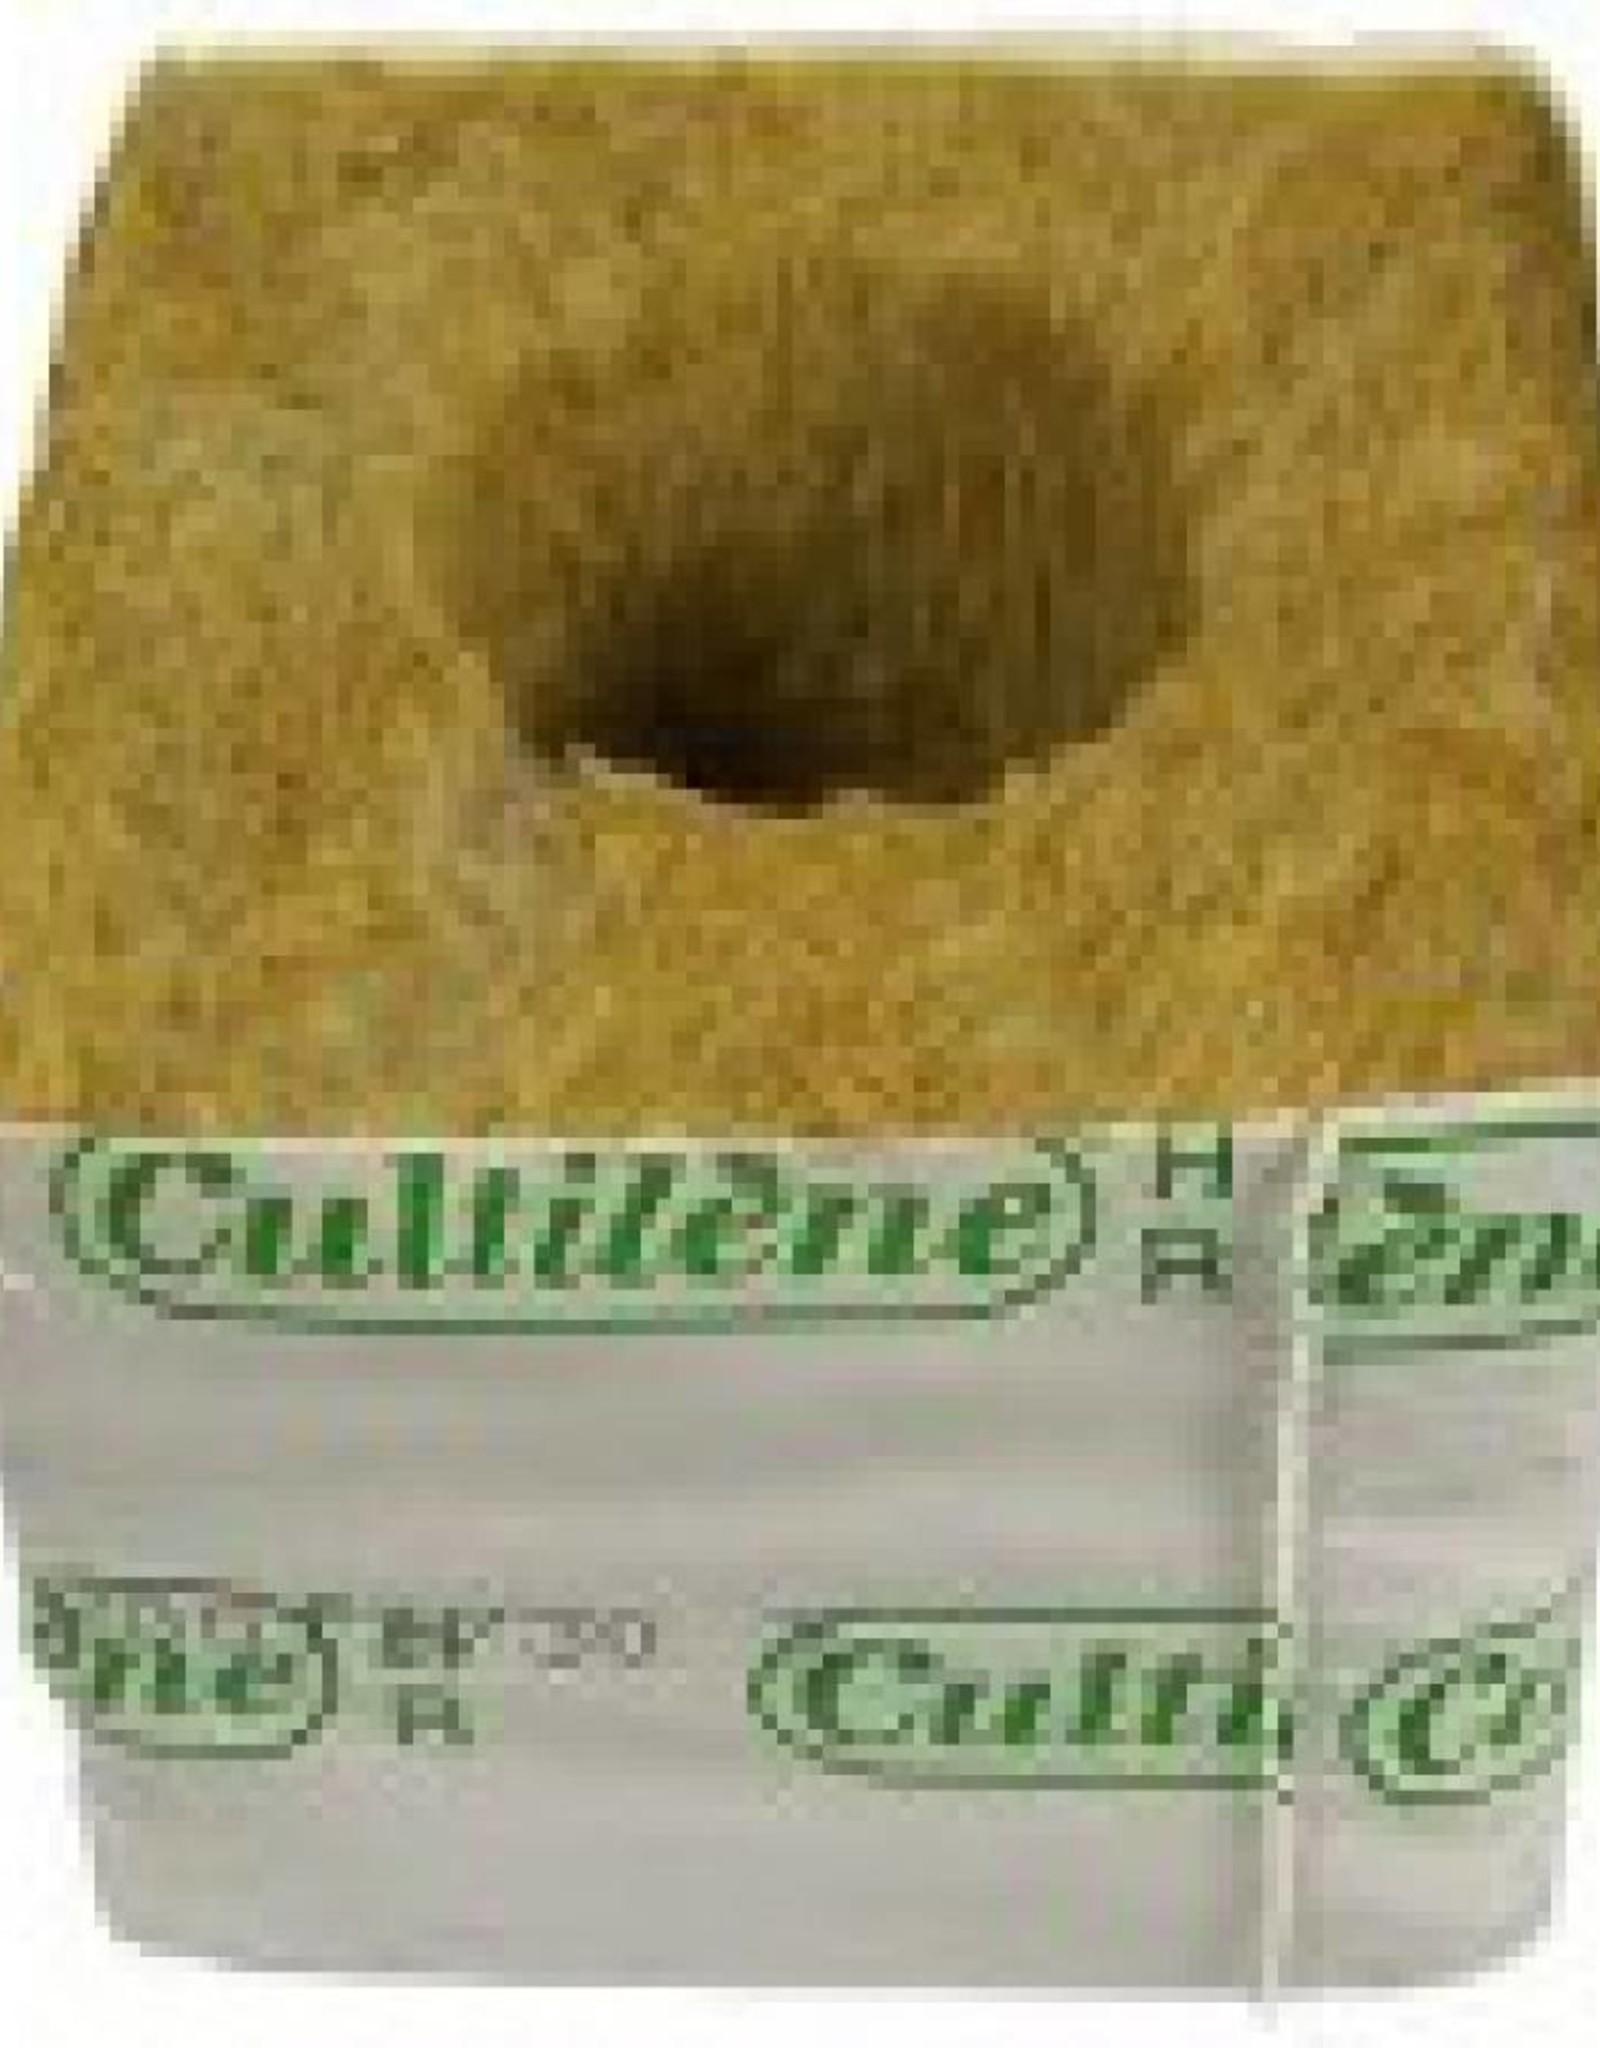 Cultilene Cultilene Kulturblock 10 x 10 x 6.5 cm 40/35  Box mit 276 Stk.